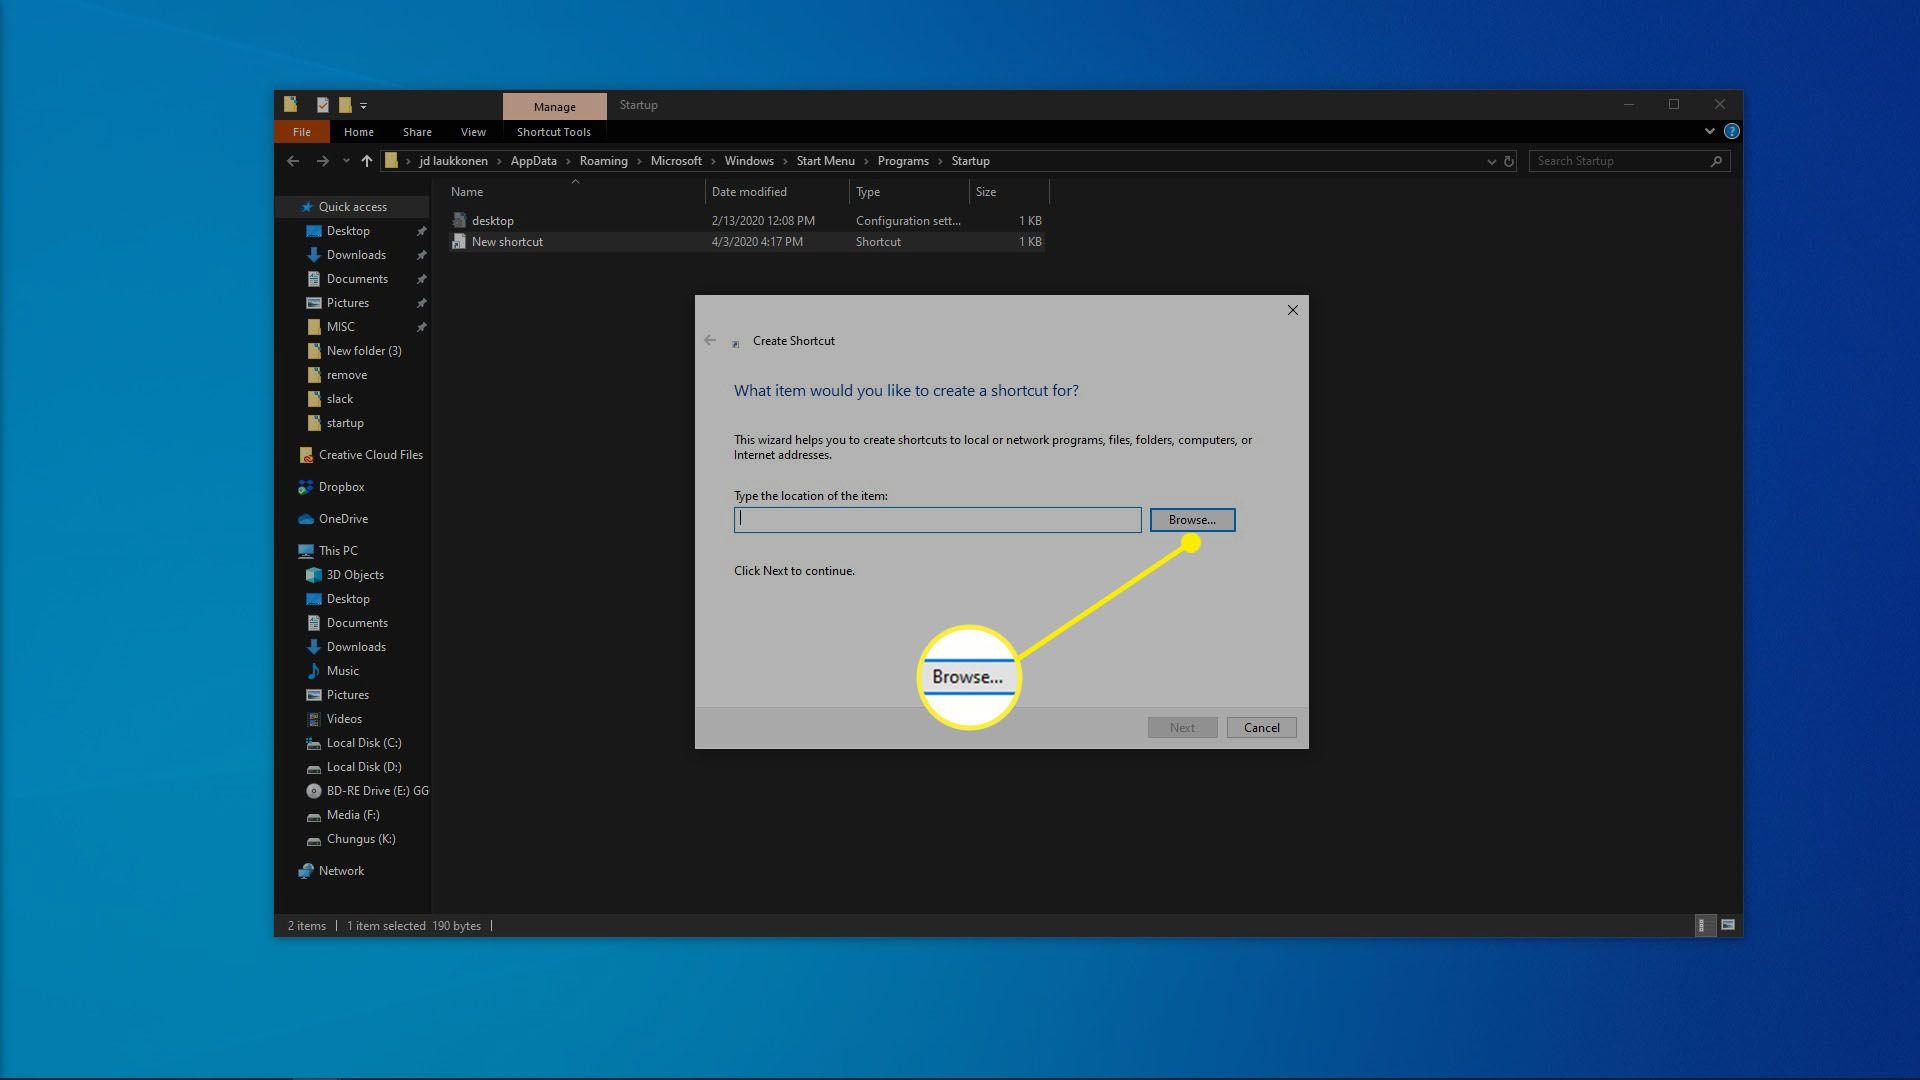 A screenshot of creating a shortcut in Windows 10.